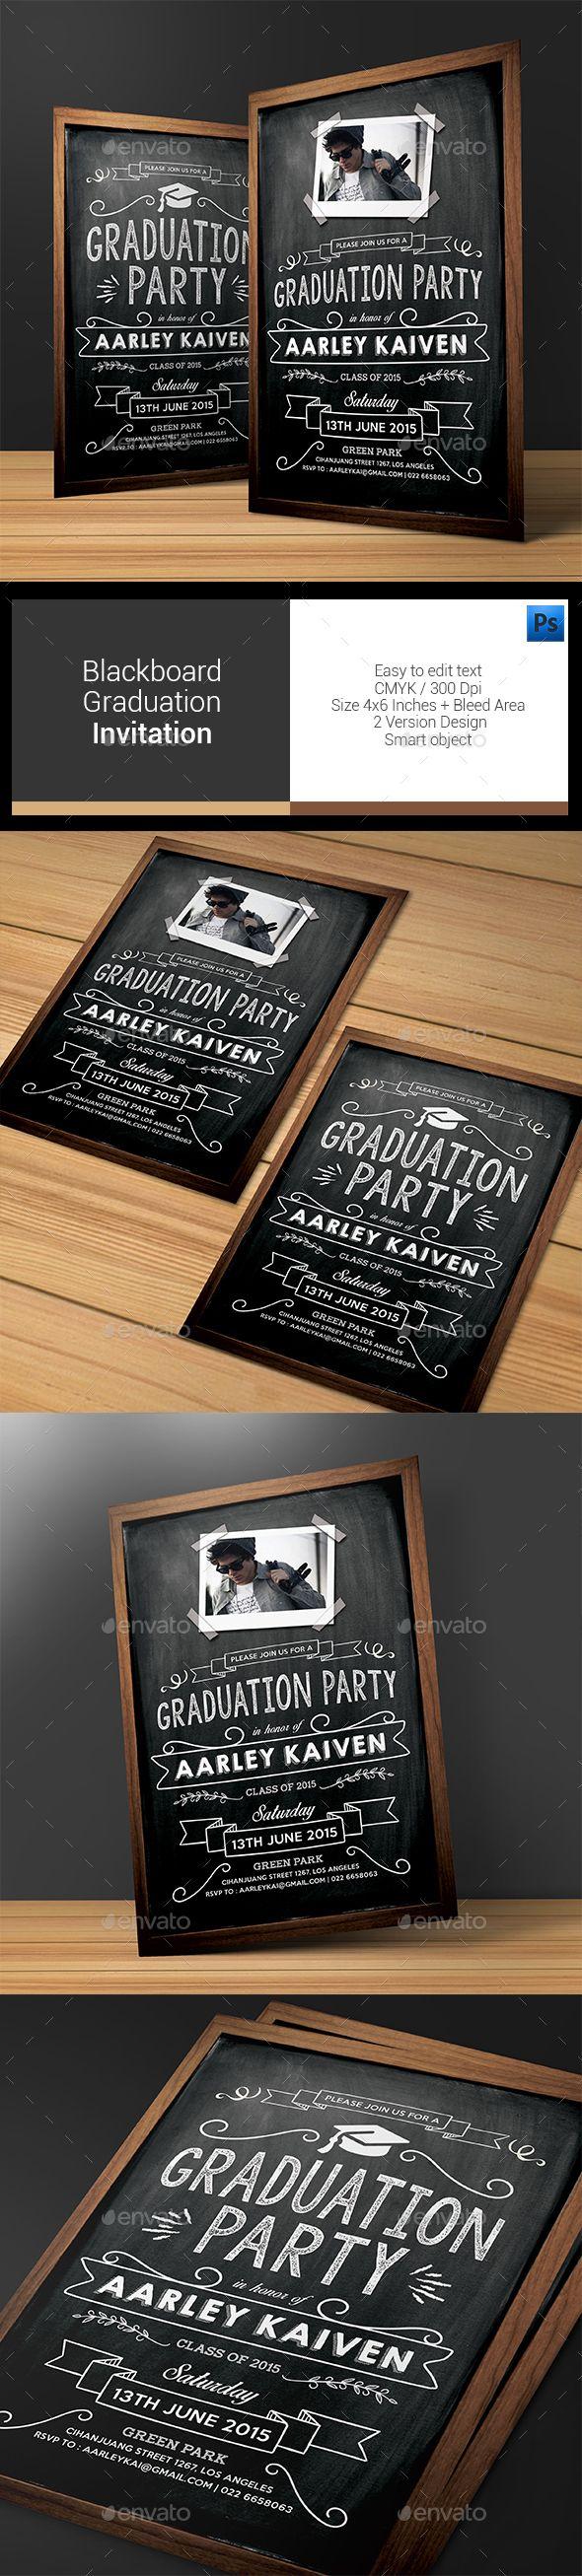 143 best Invitation Cards images on Pinterest   Invitation cards ...